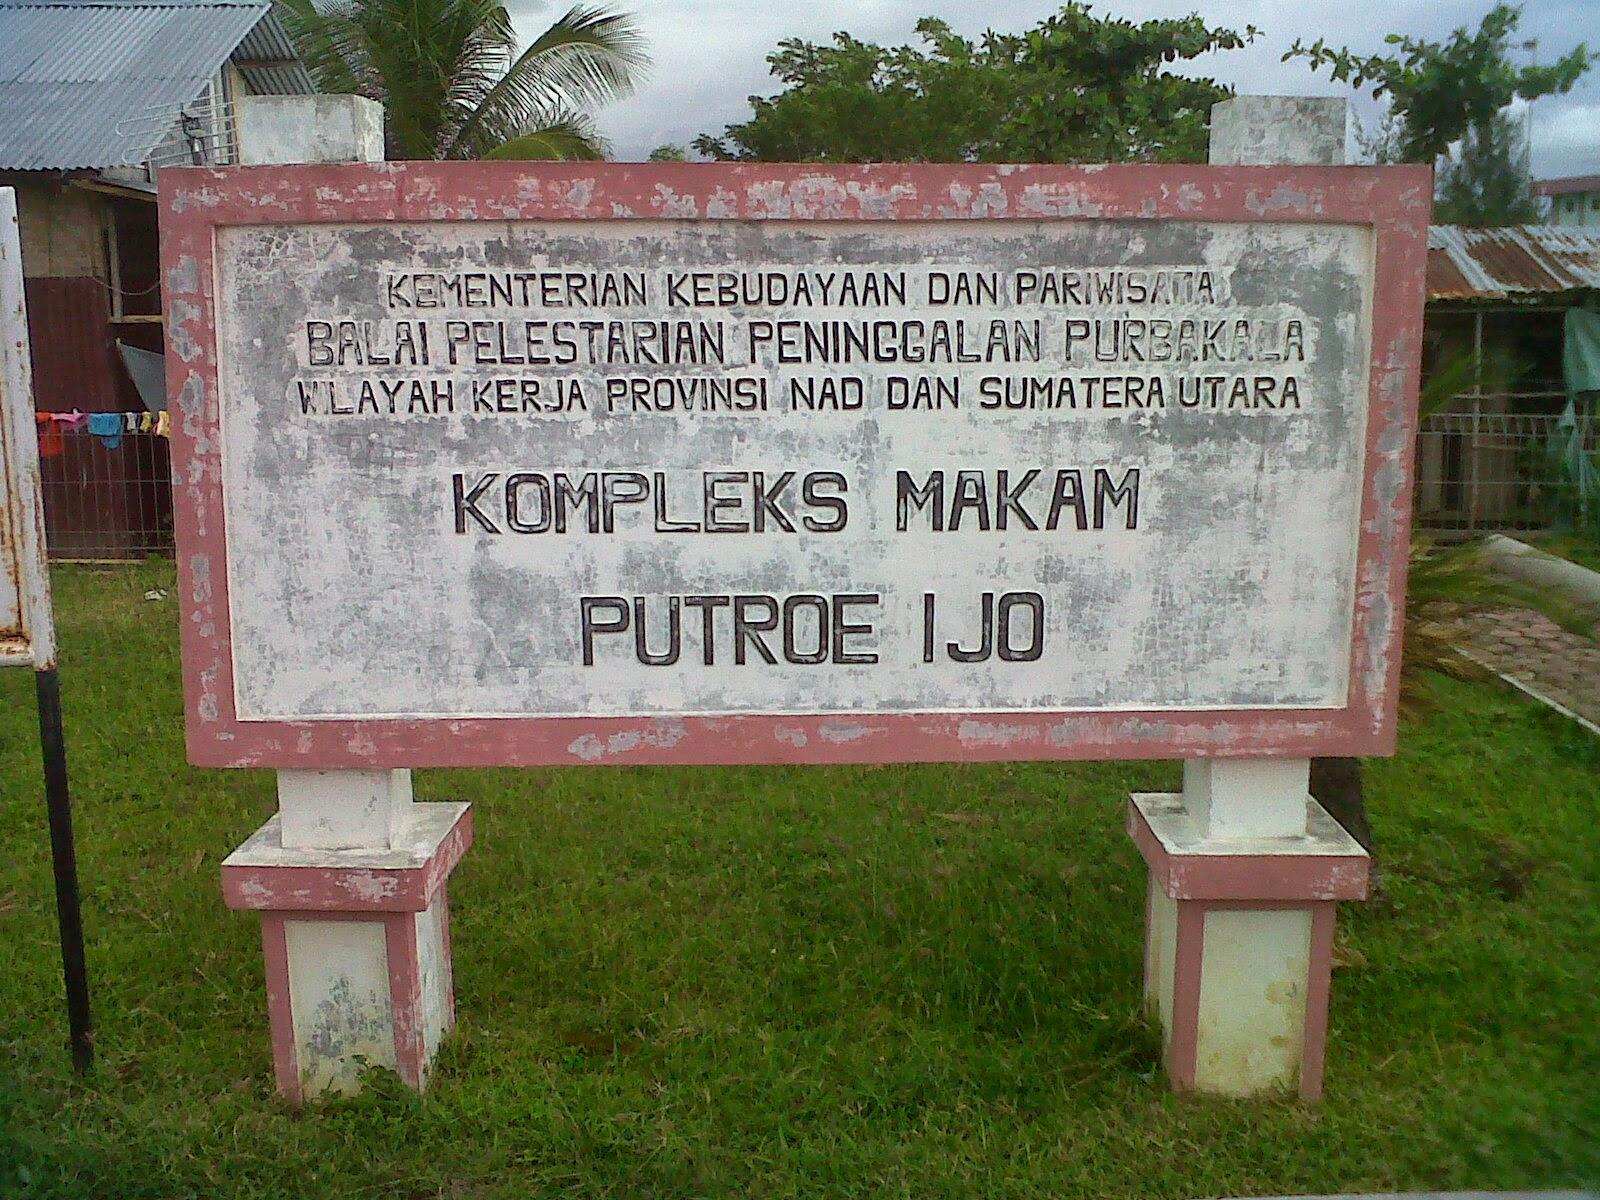 Life Aceh Komplek Makam Putroe Ijo Sultan Kandang Xii Kota